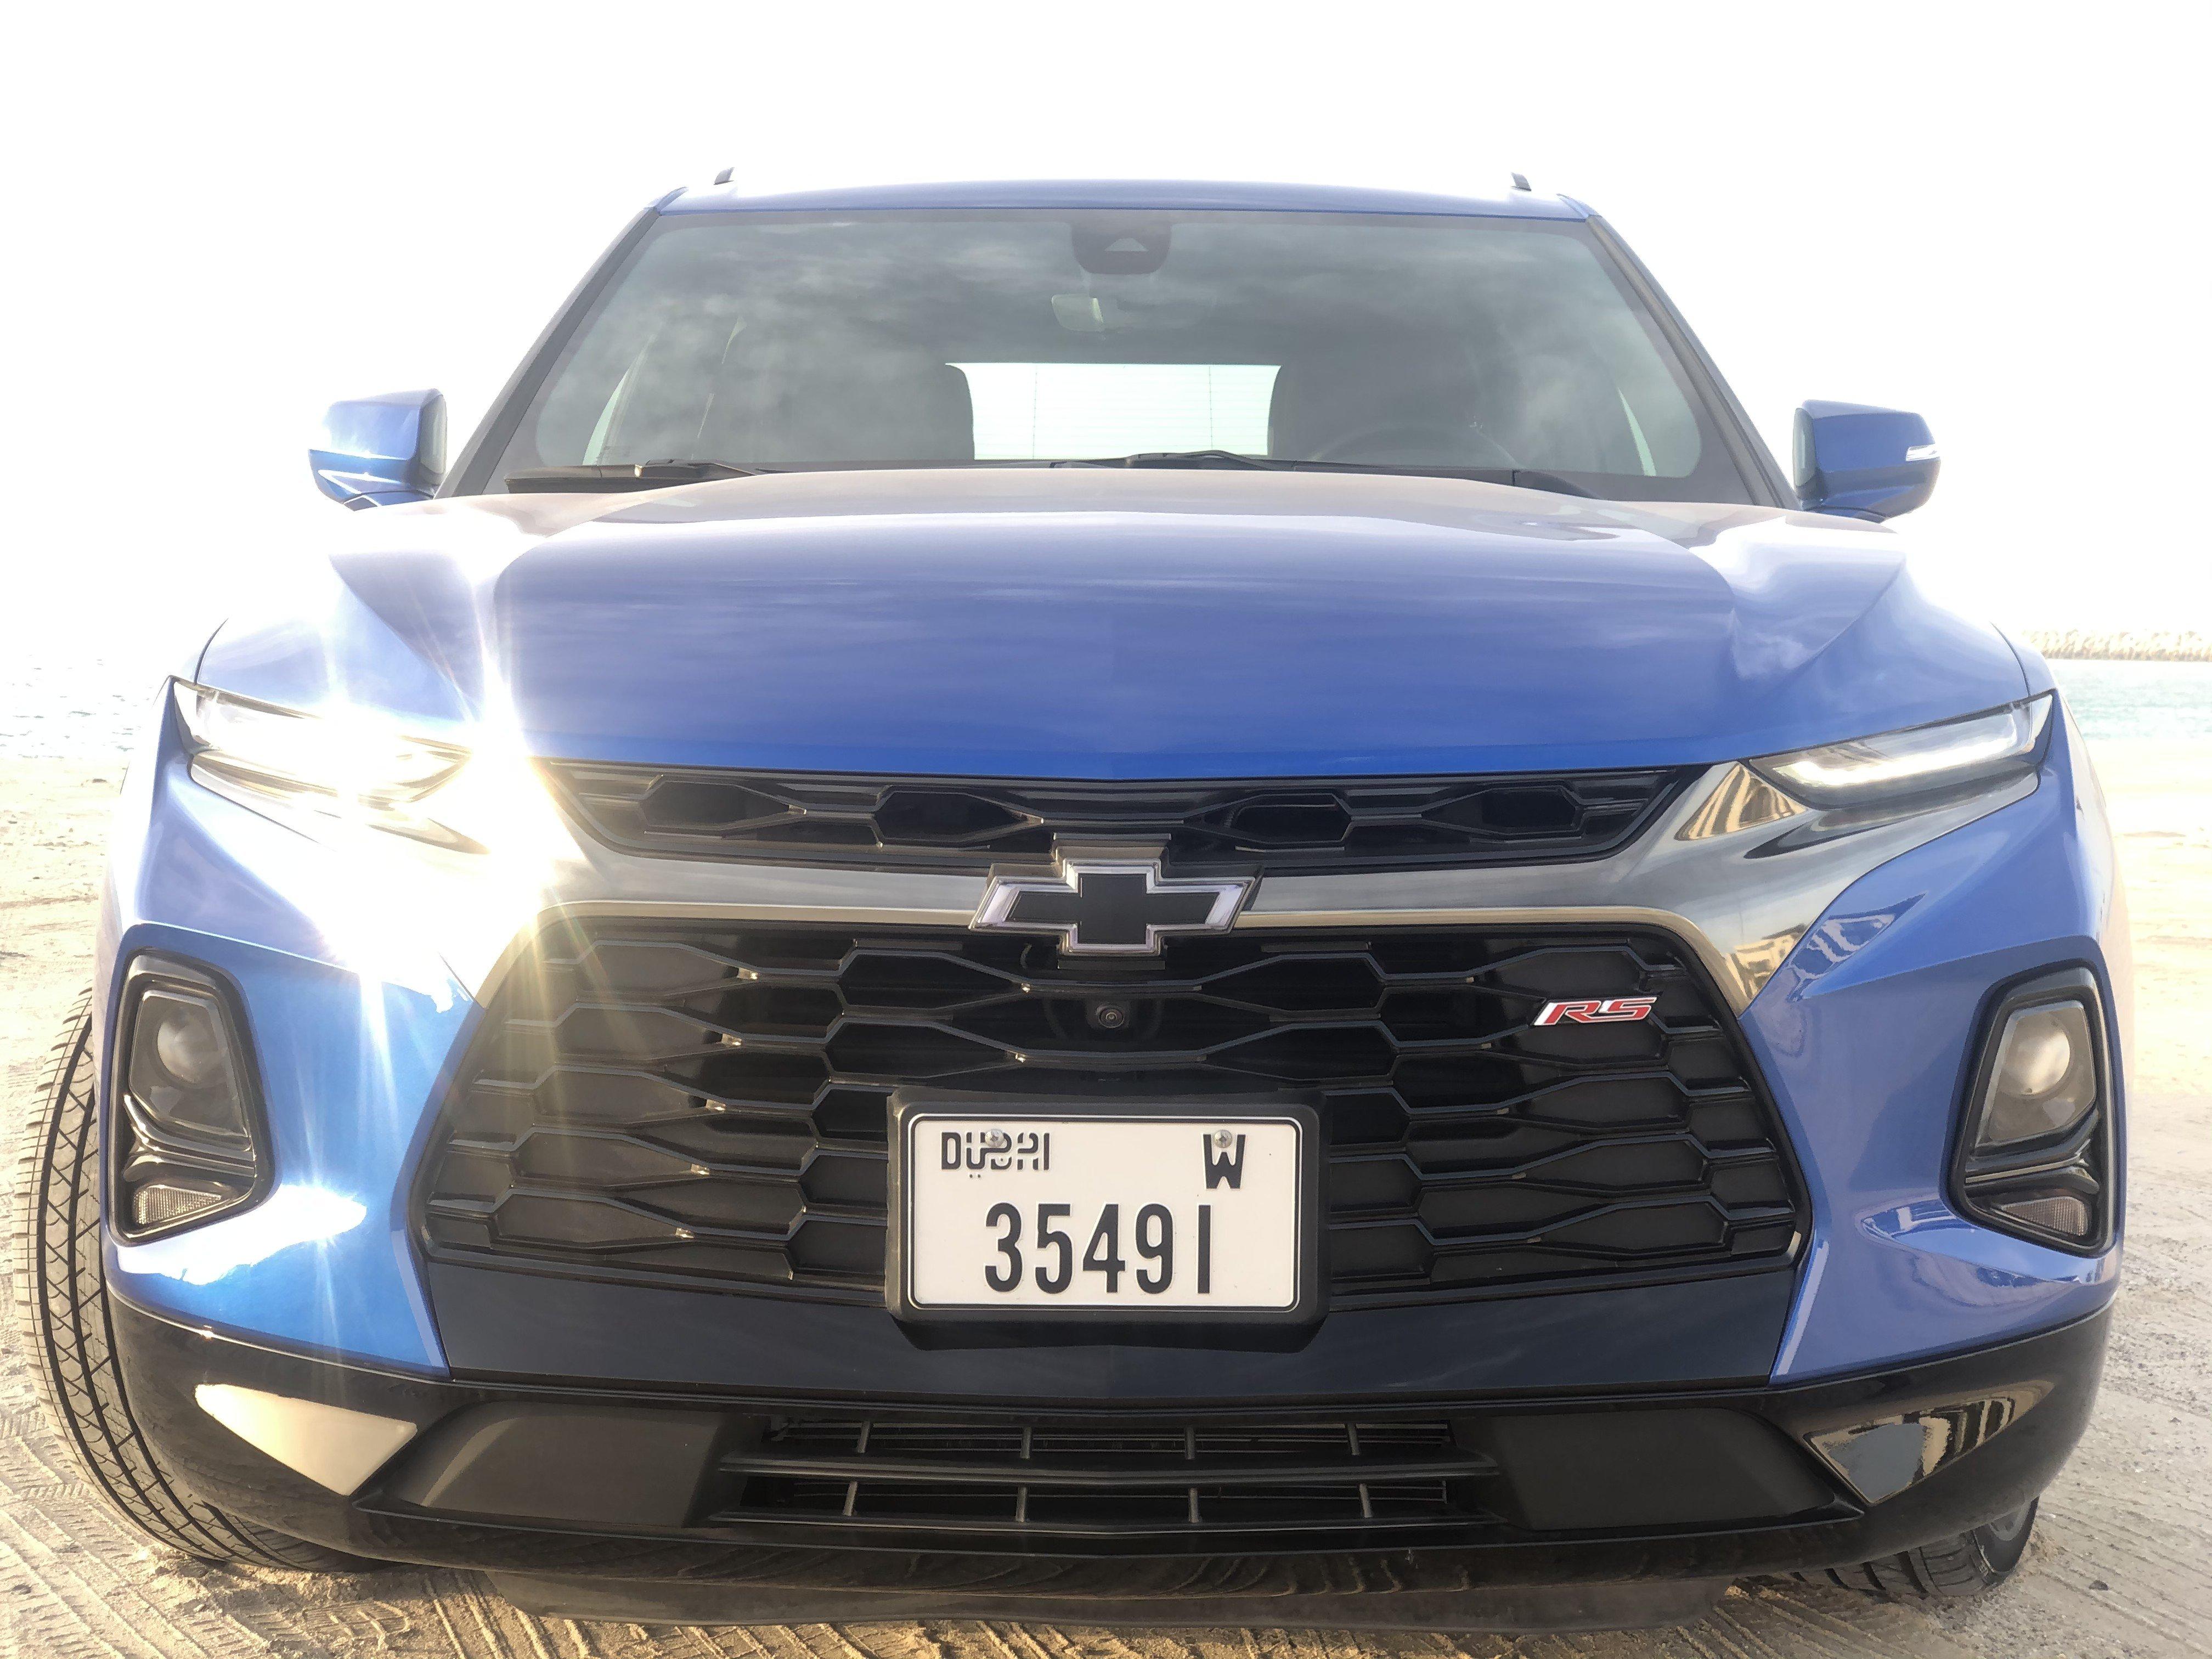 Chevrolet Blazer 2019 external shot